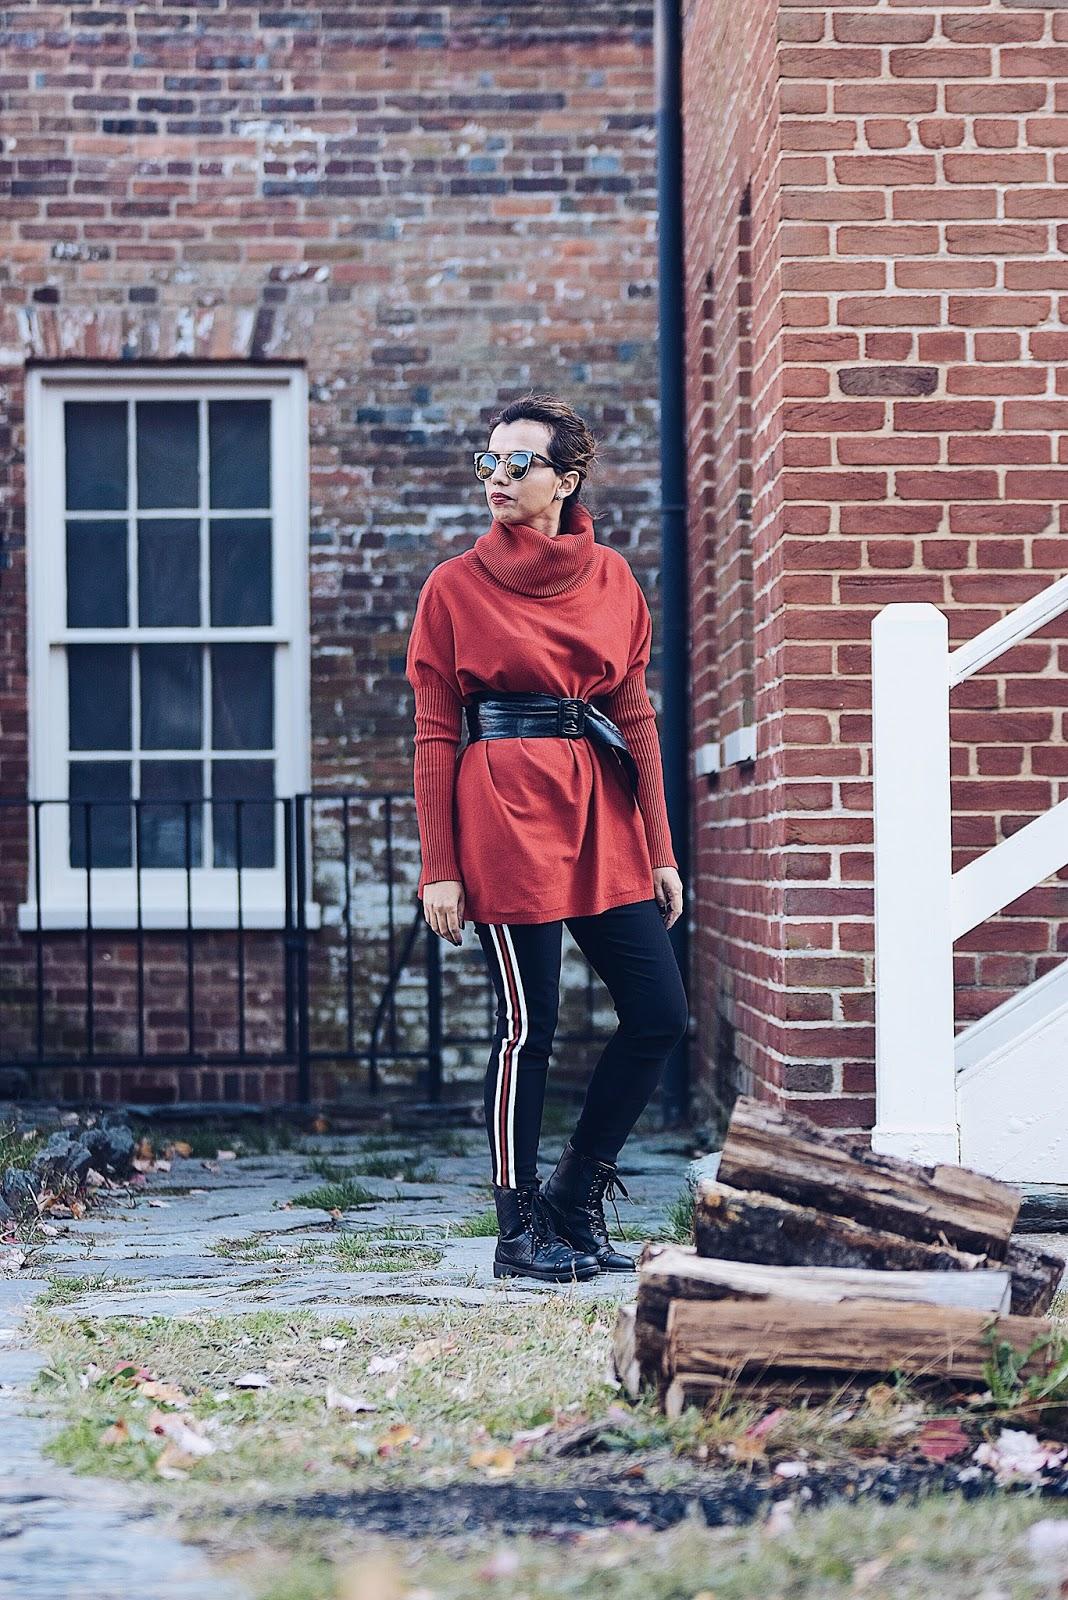 Los In Harpers Ferry by Mari Estilo. Wearing: Pants: SheIn Sweater: Choies Bag: Coach